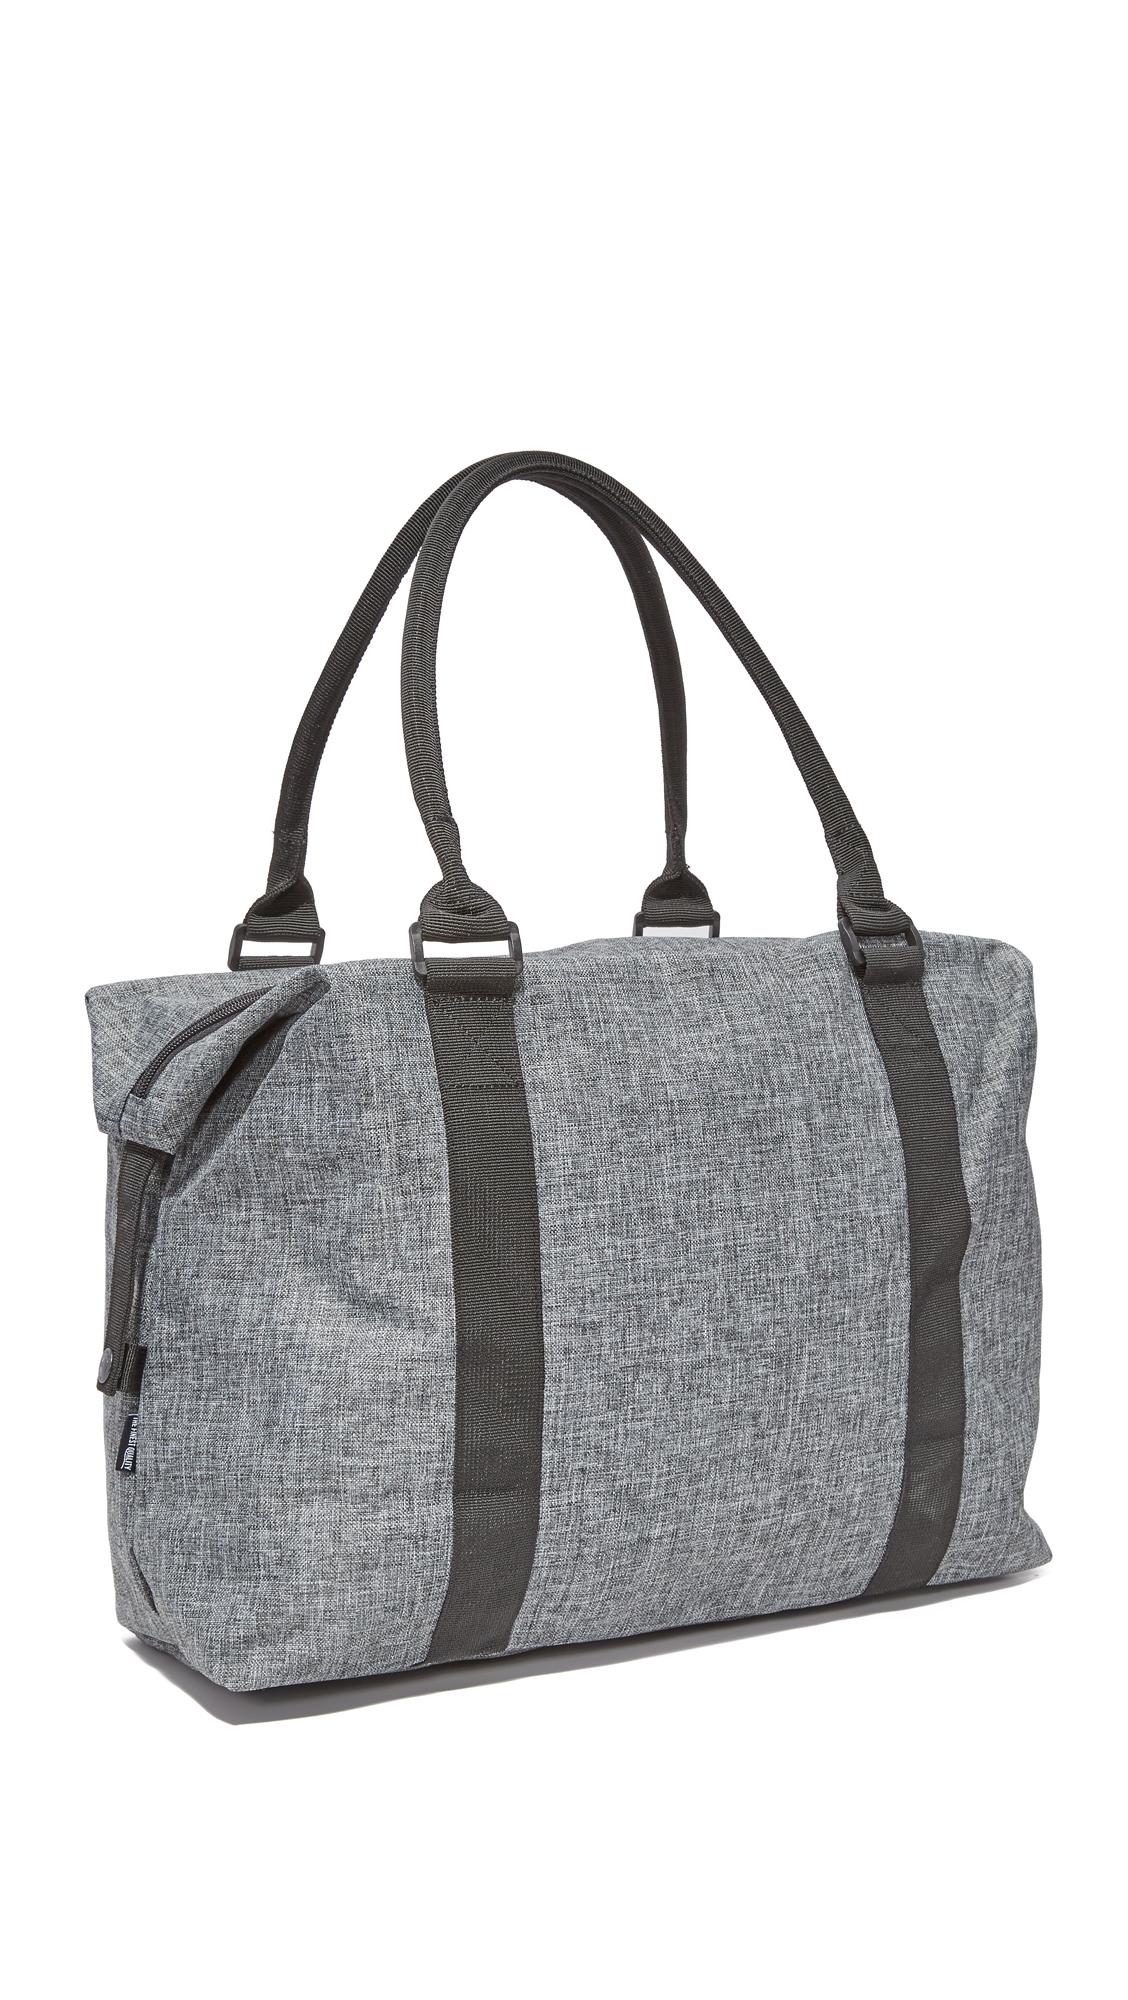 Herschel Supply Co. Canvas Strand Mid Size Duffel Bag in Black